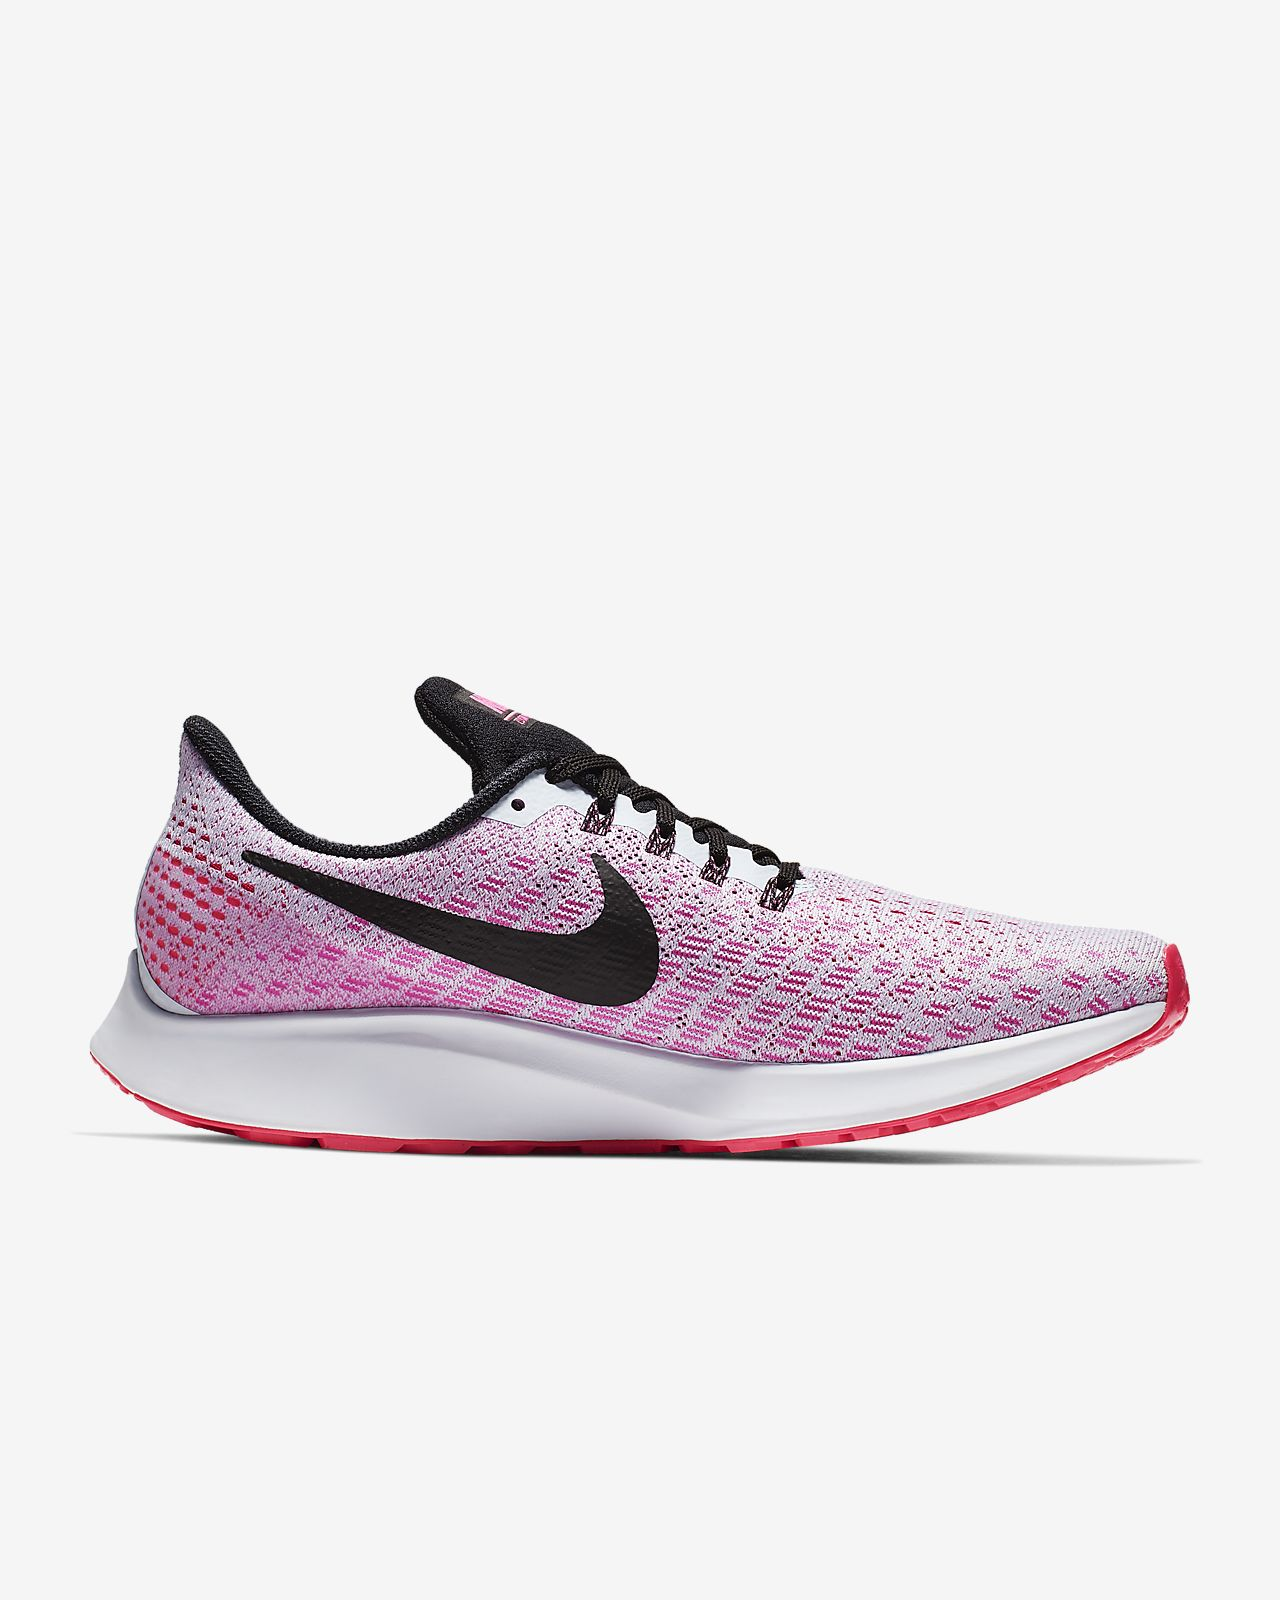 promo code 5c896 b846f ... Nike Air Zoom Pegasus 35 Zapatillas de running - Mujer